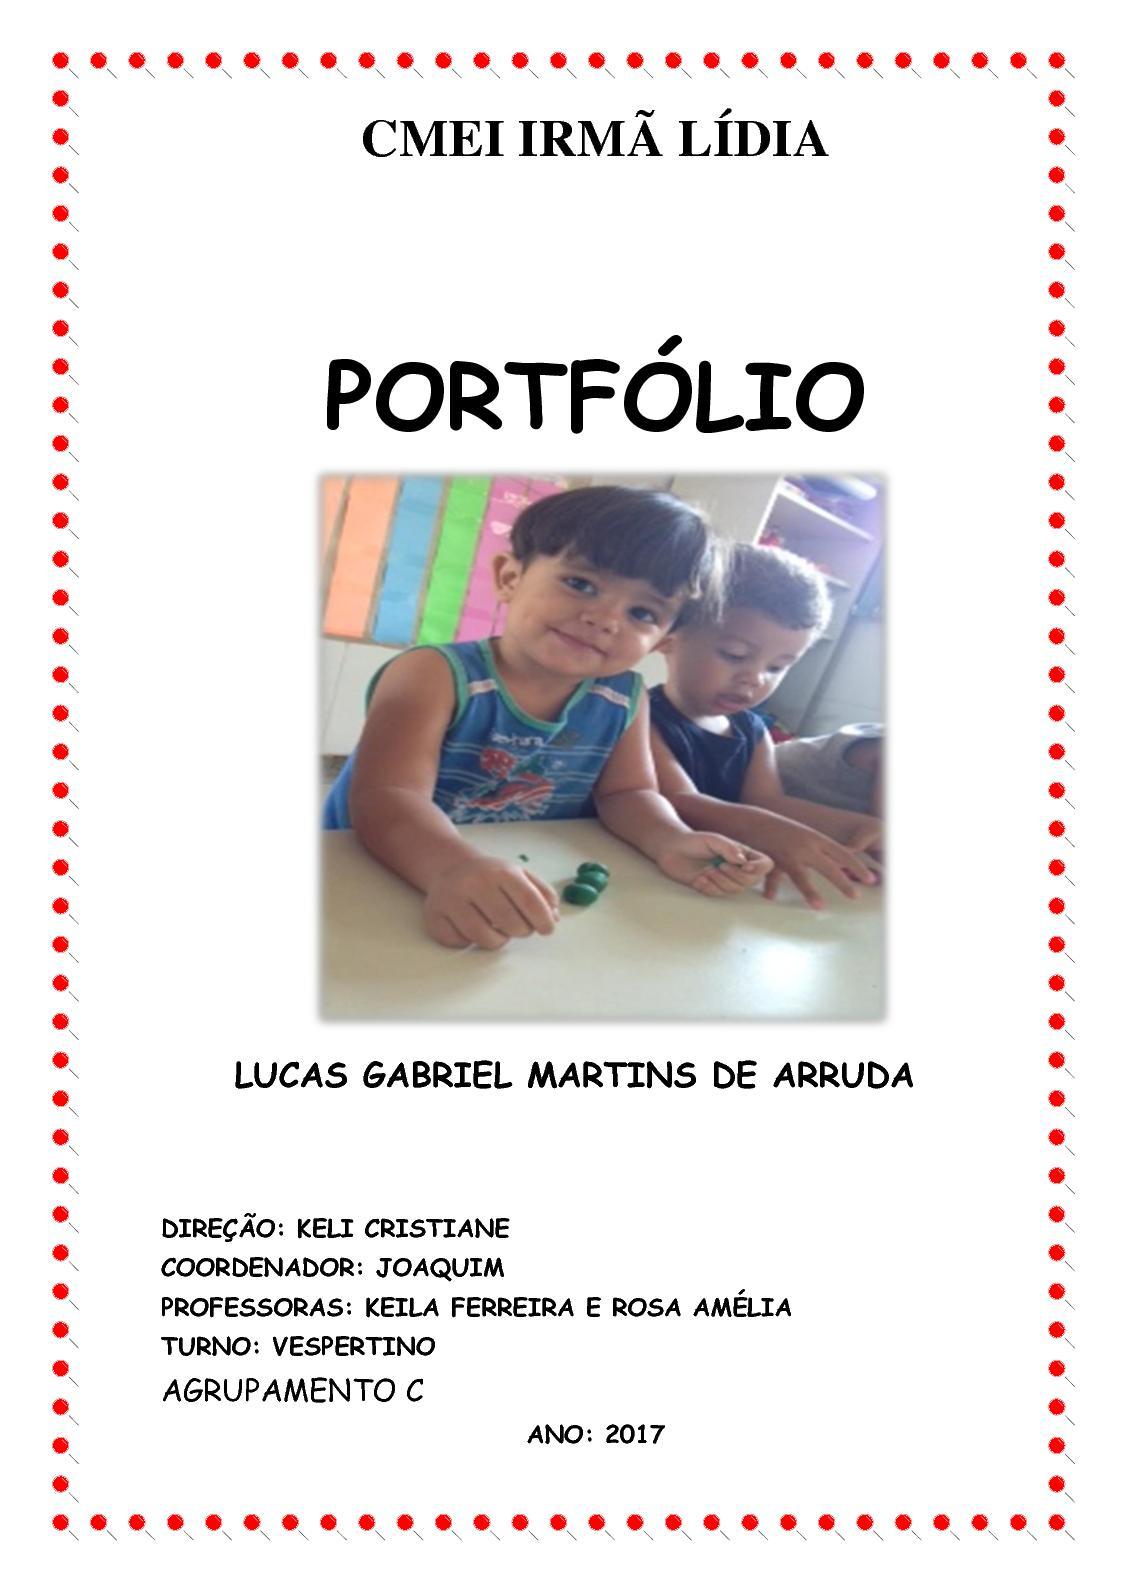 Lucas Agrup C